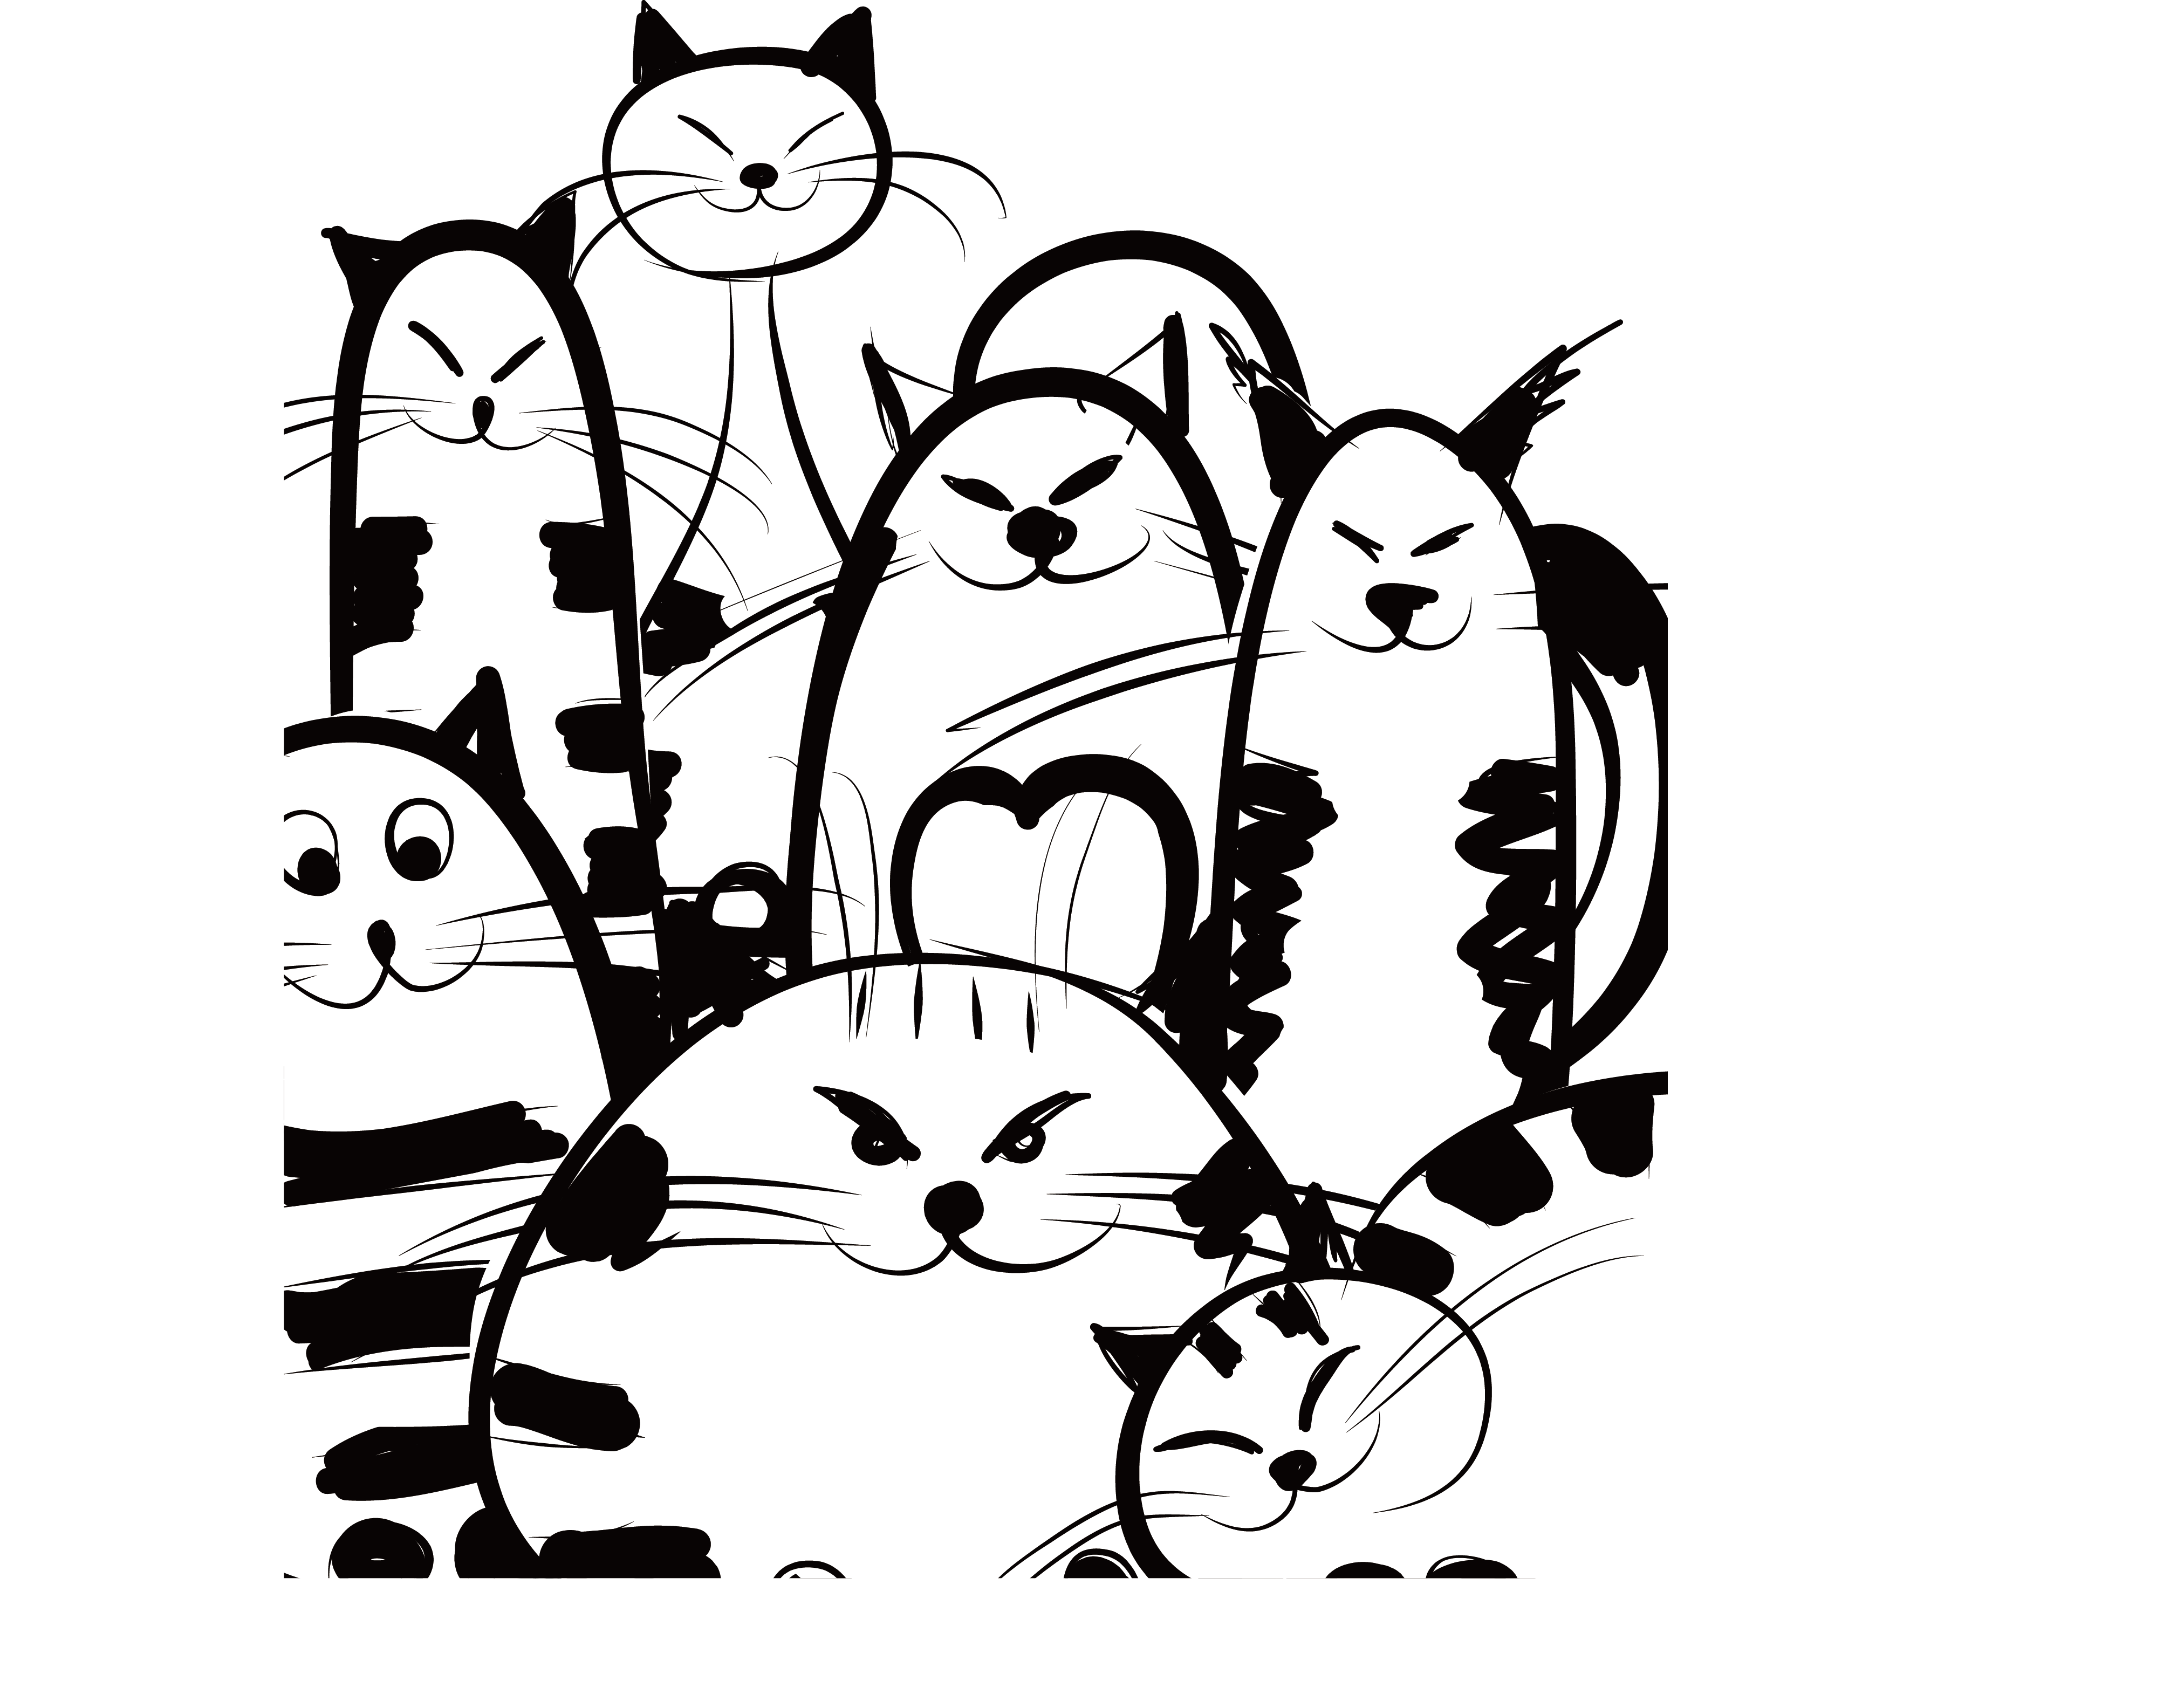 Facebook clipart business card. Cat design corporation creative